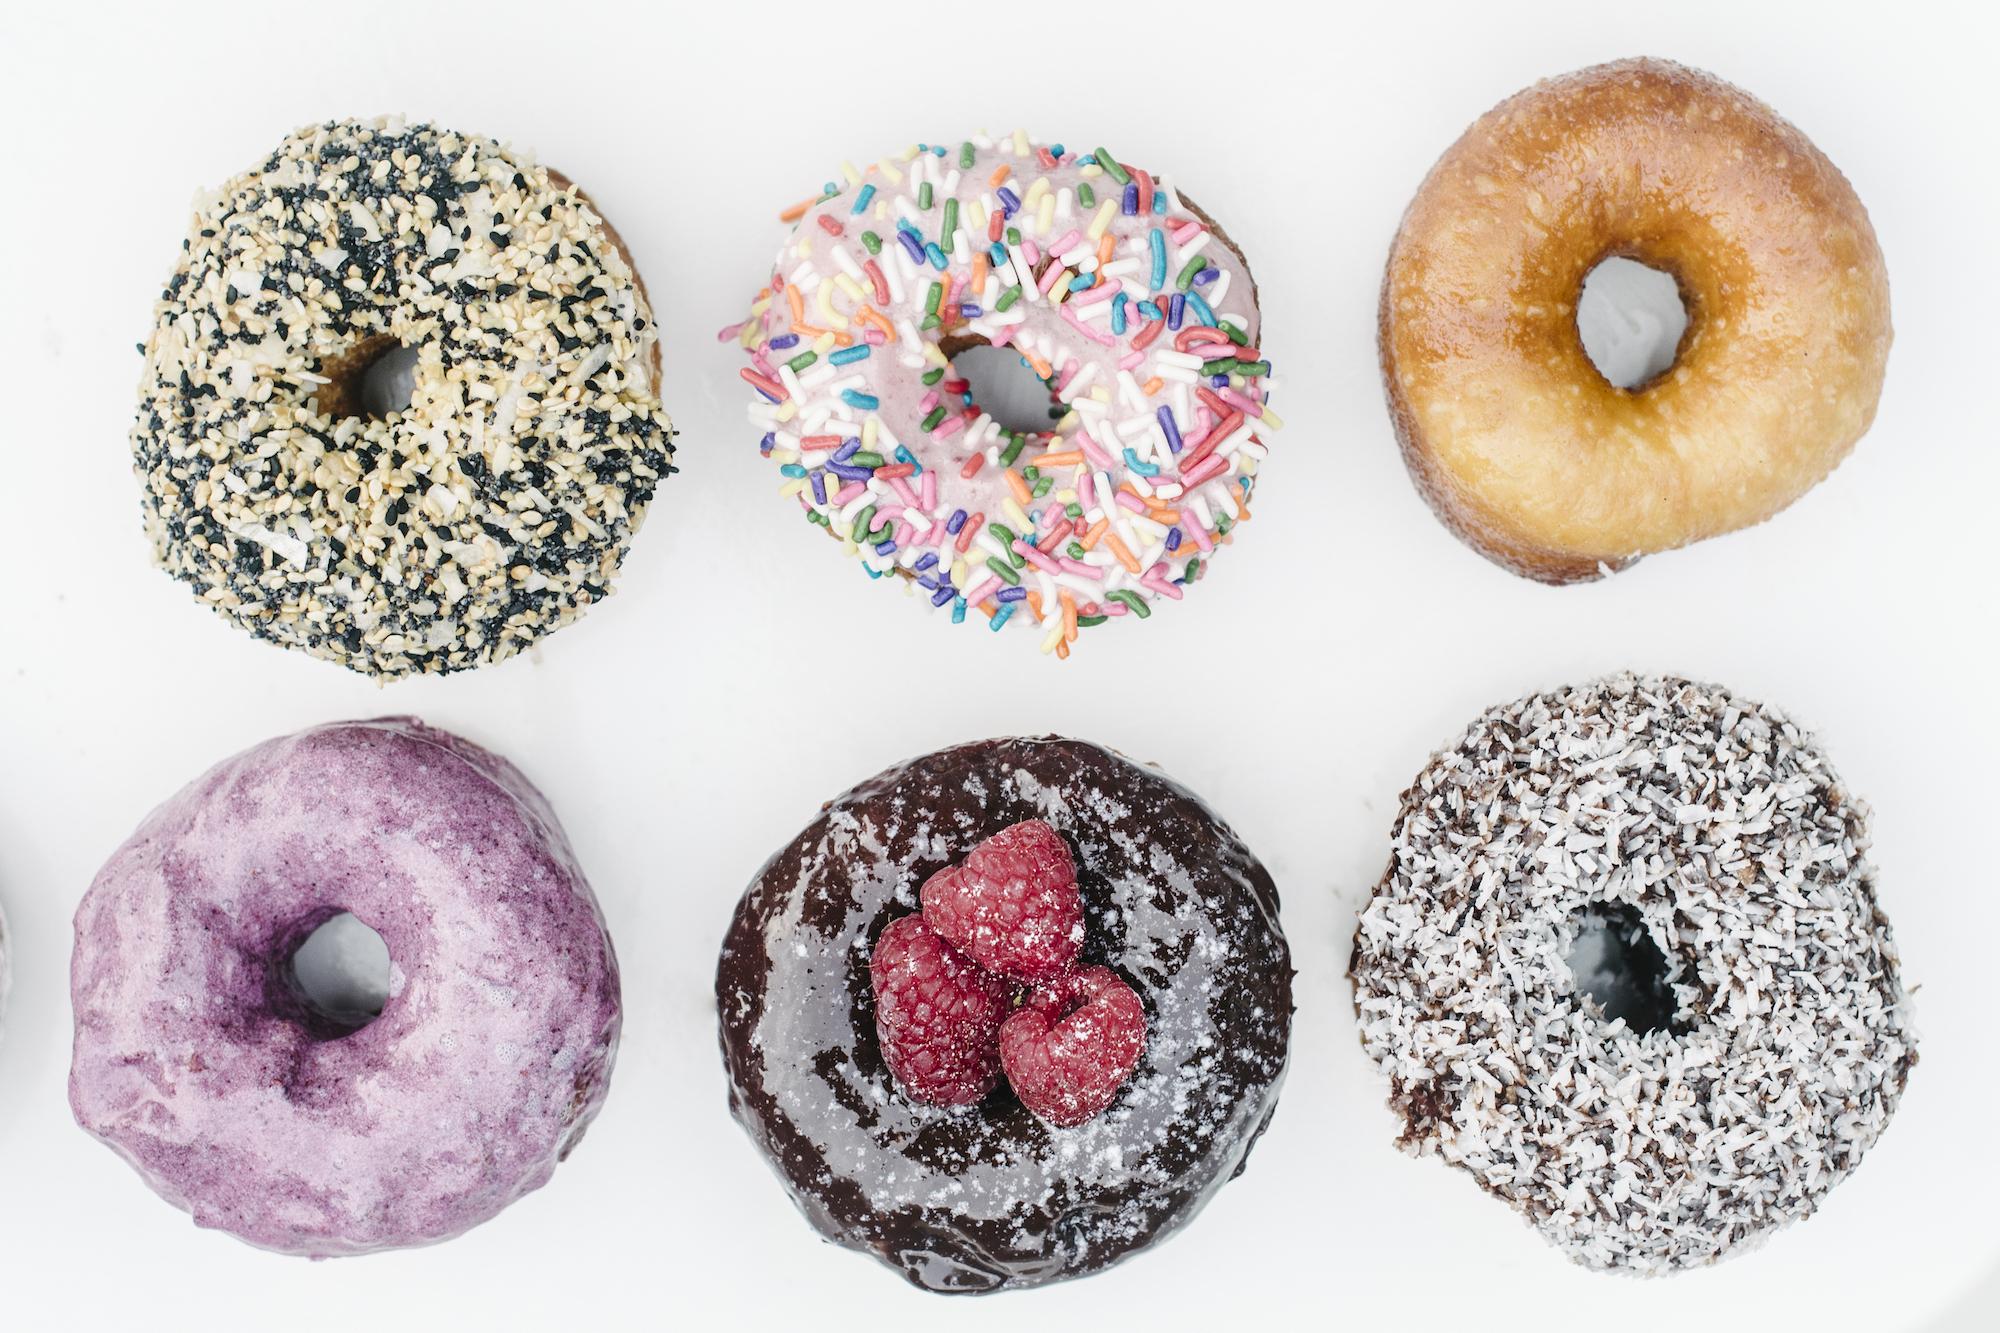 MTC Grindstone Coffee & Donuts 58